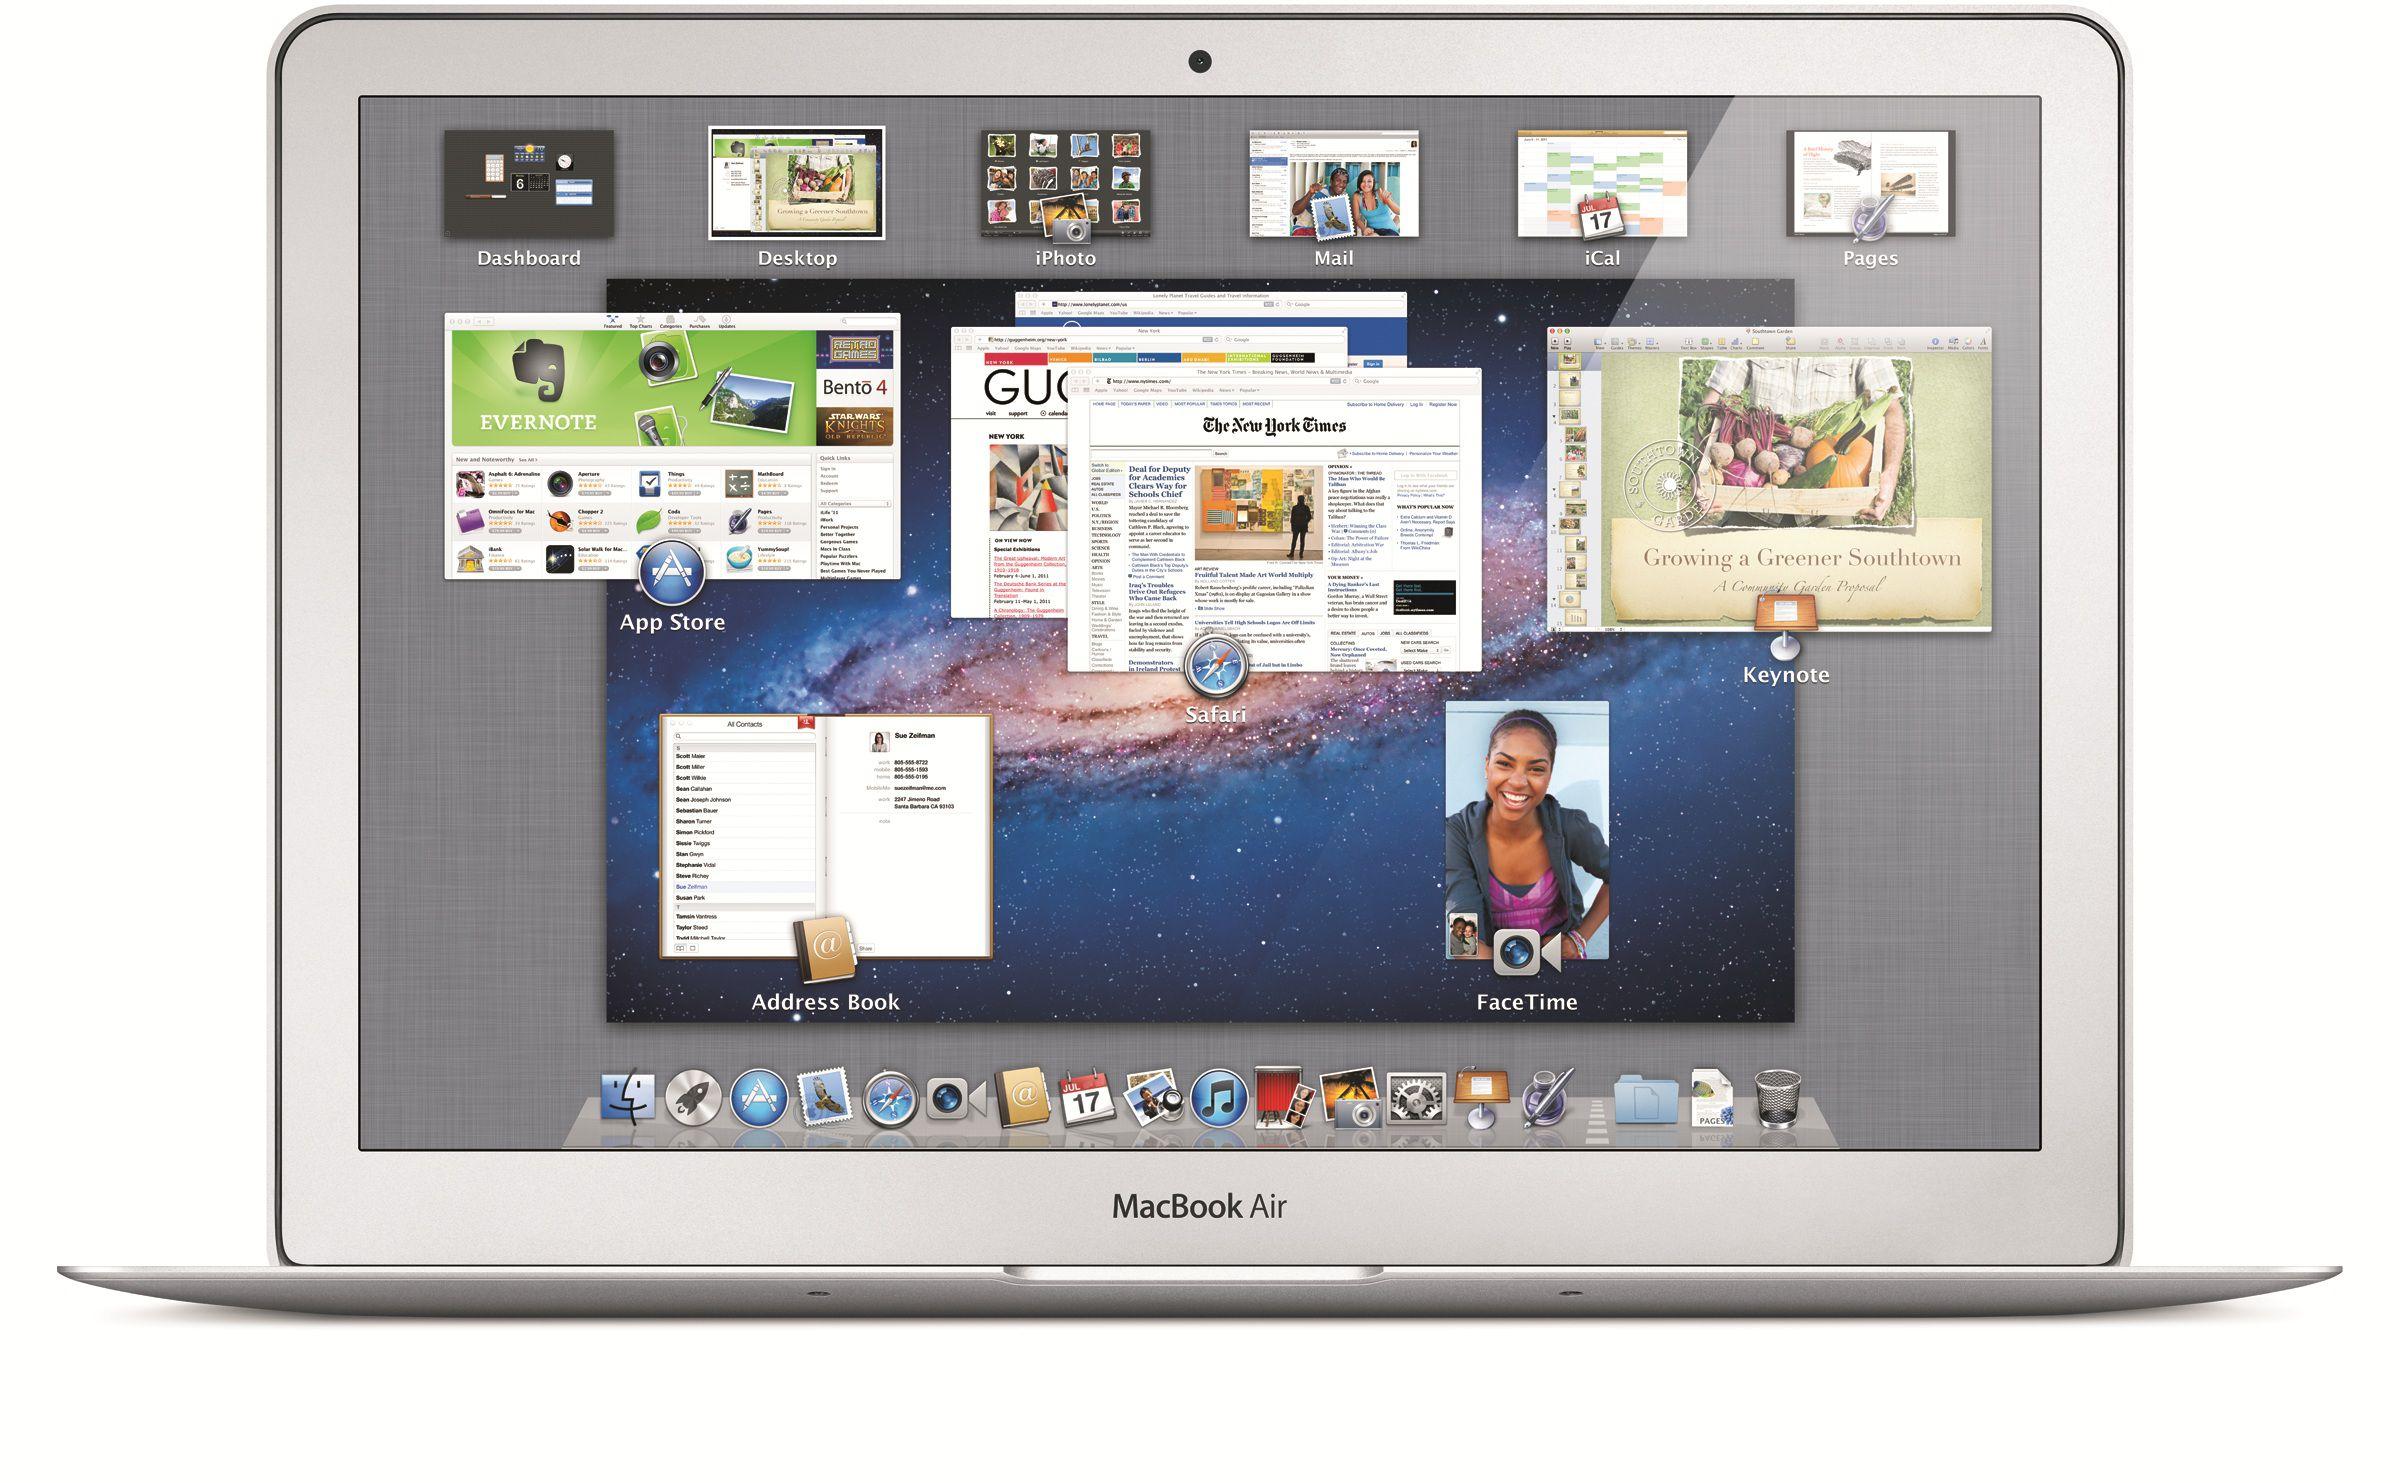 02-Mac-OS-X-auf-dem-normalen-Computer_Der-Supportnet-Adventskalenderwunsch-zum-16-Dezember-Apple-Screenshot-470.jpg?nocache=1323951921400